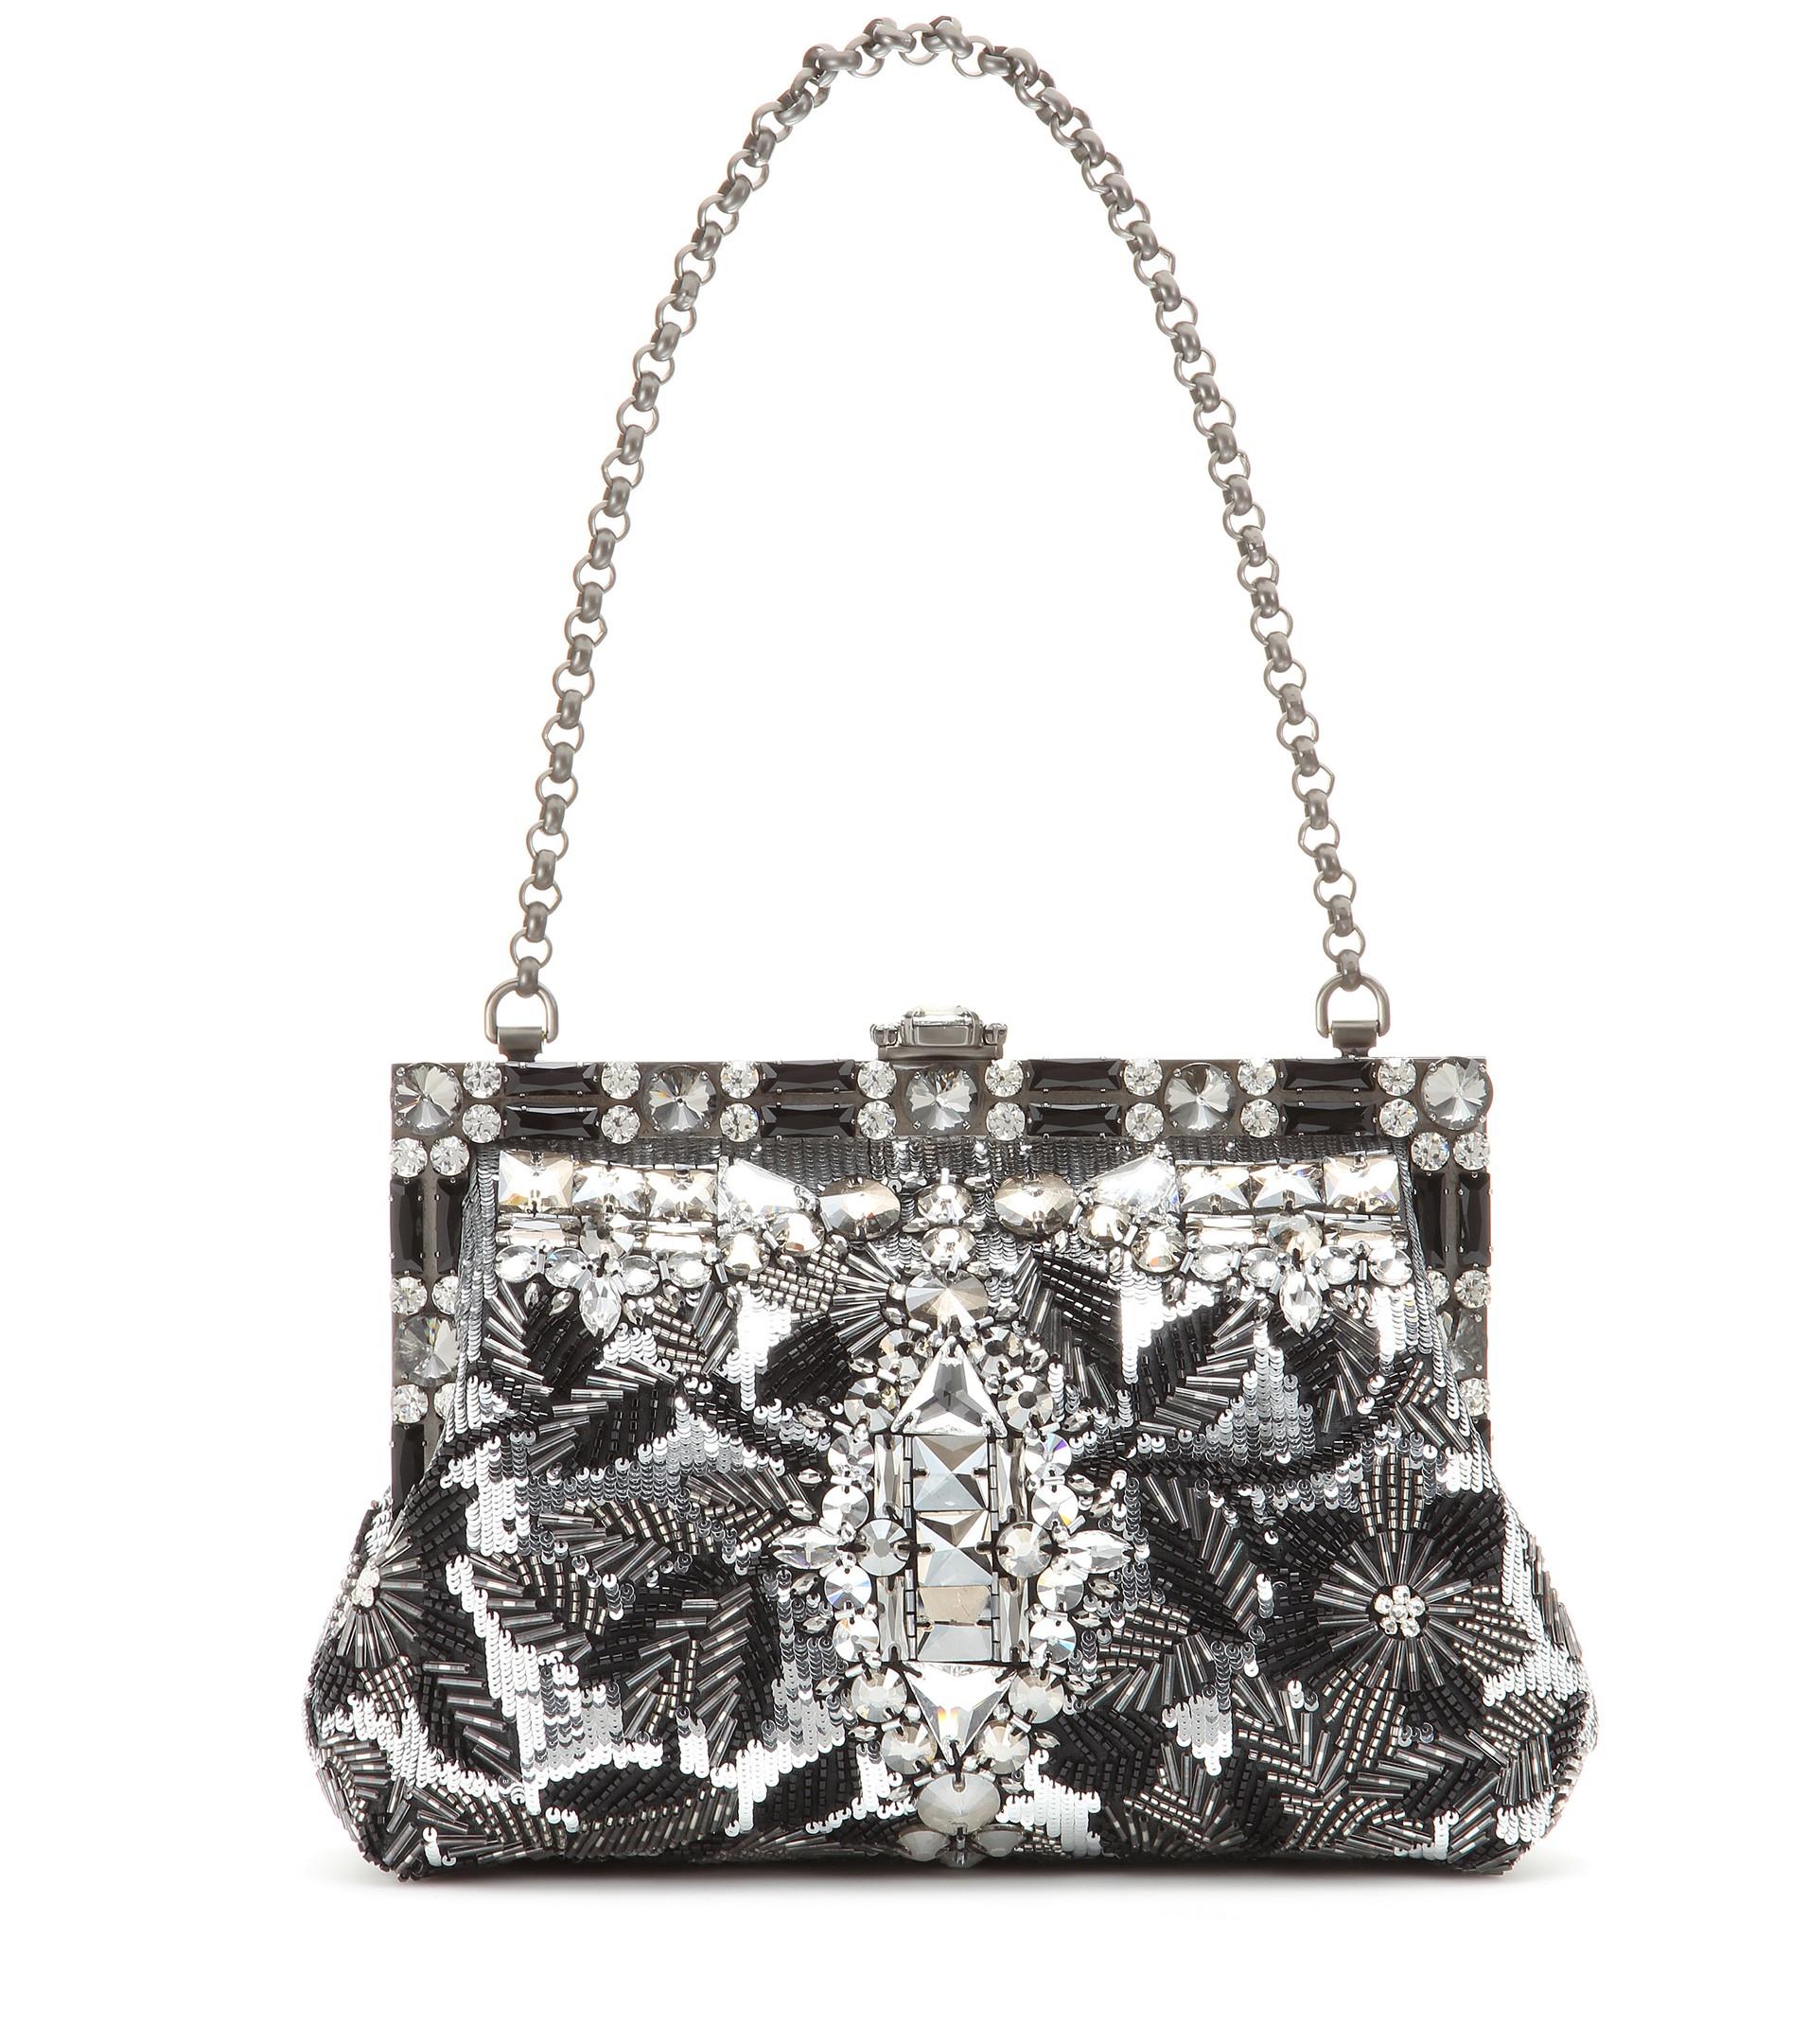 Lyst - Dolce   Gabbana Vanda Sequined-Embellished Bag in Metallic 5a7ded50cf0